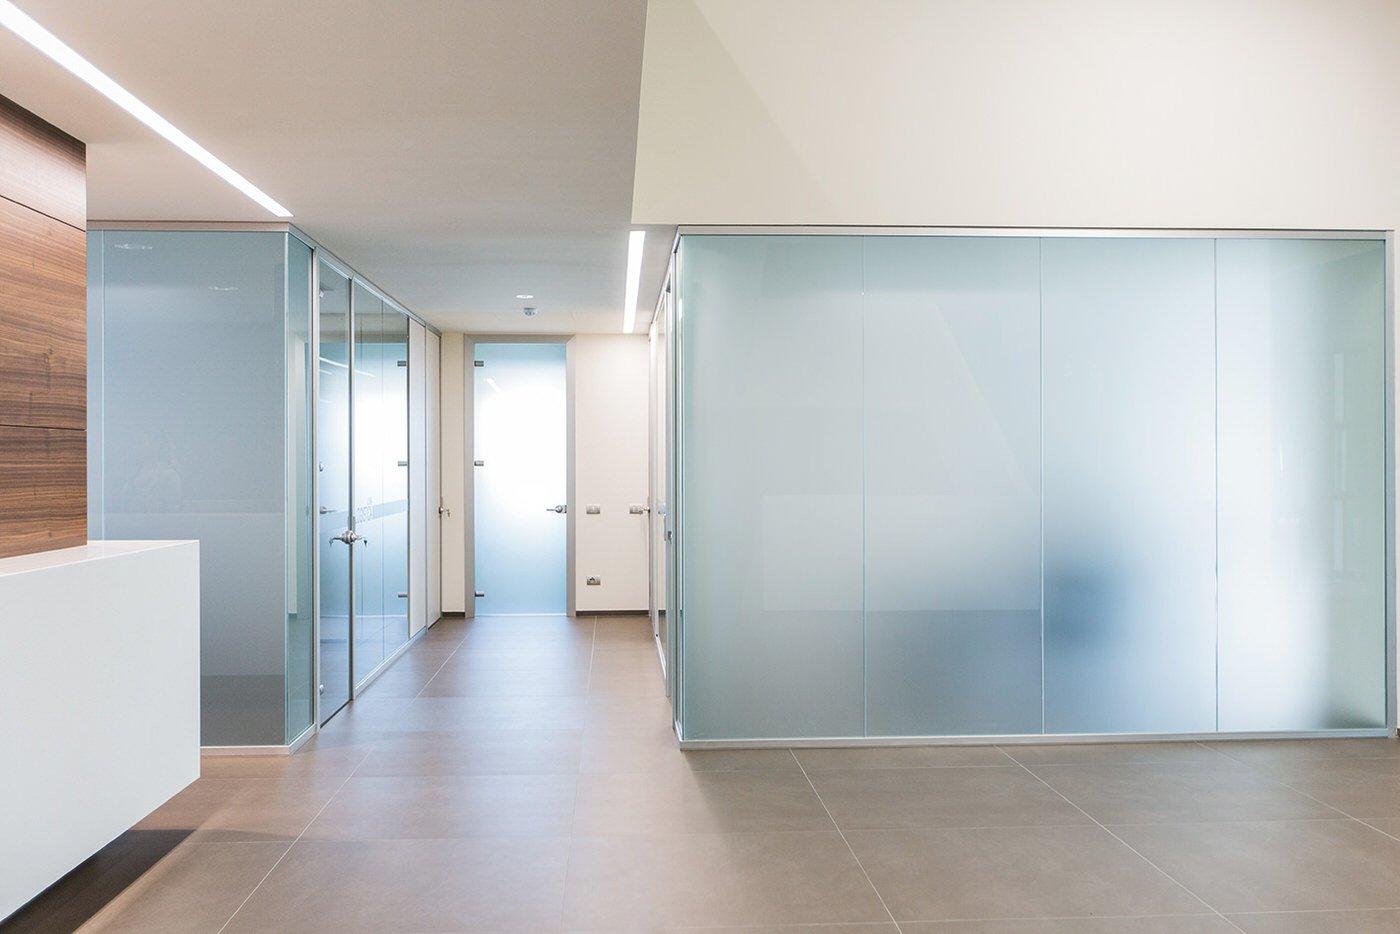 Parete per ufficio evo light pareti divisorie per ufficio for Pareti per ufficio